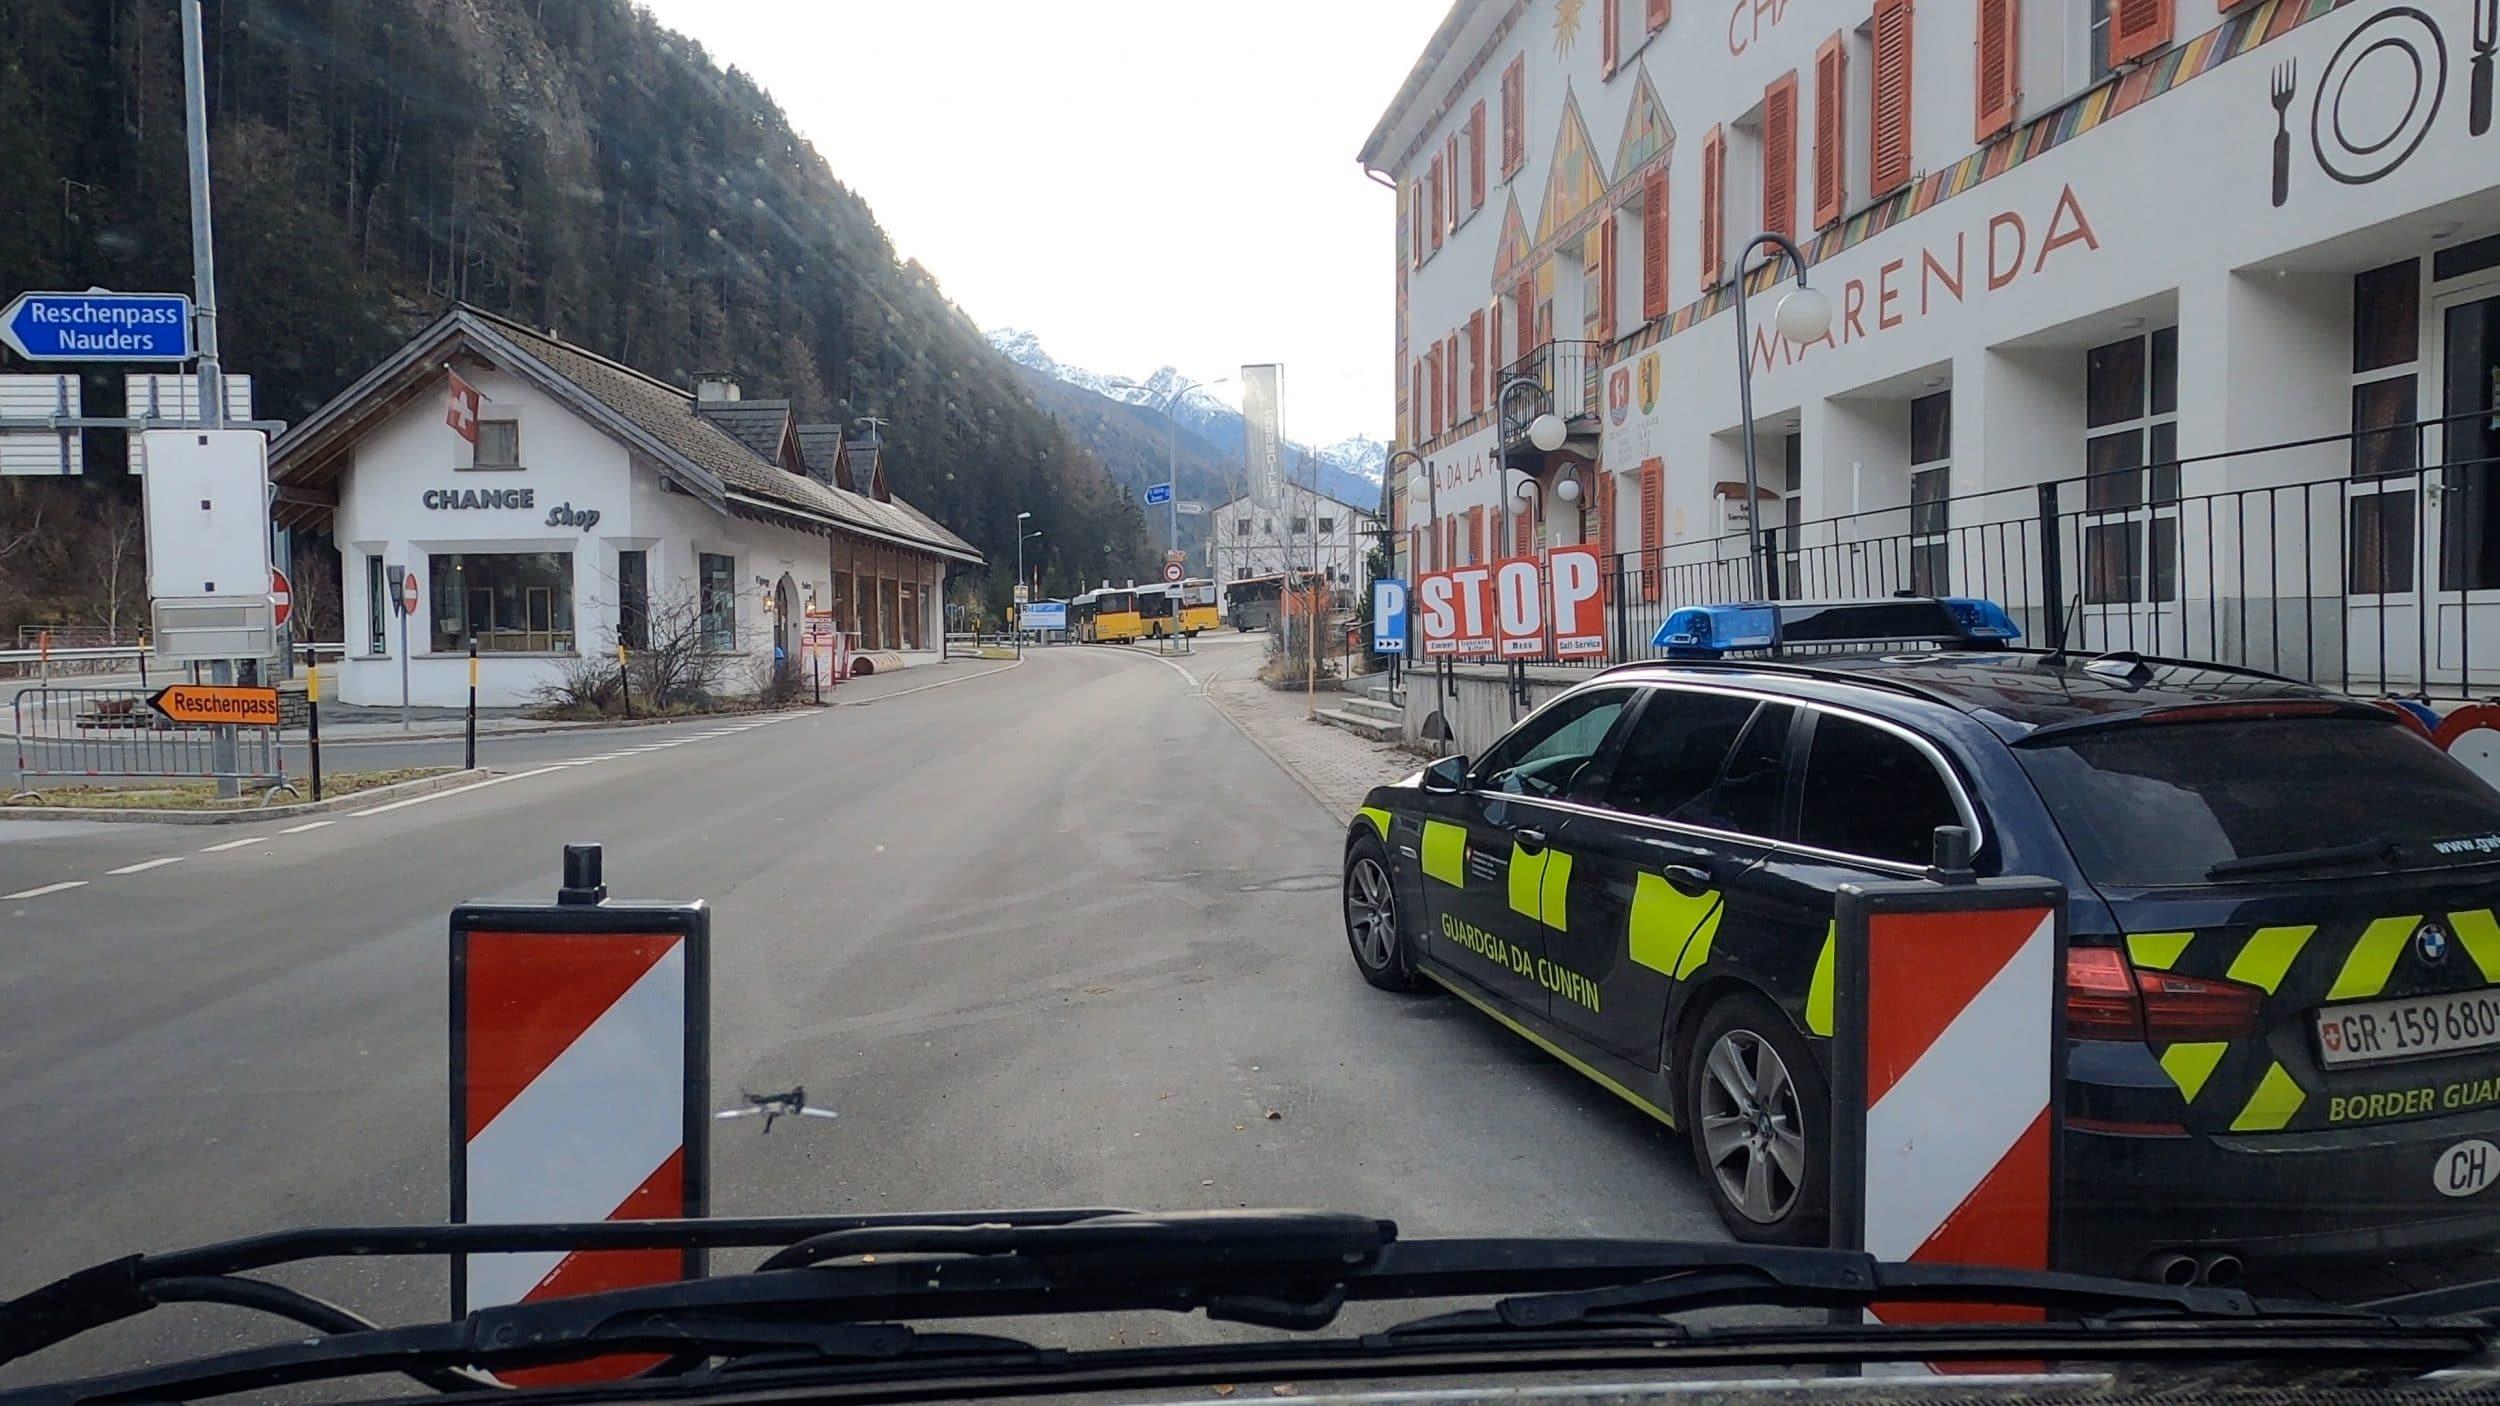 Frontera Suiza camper